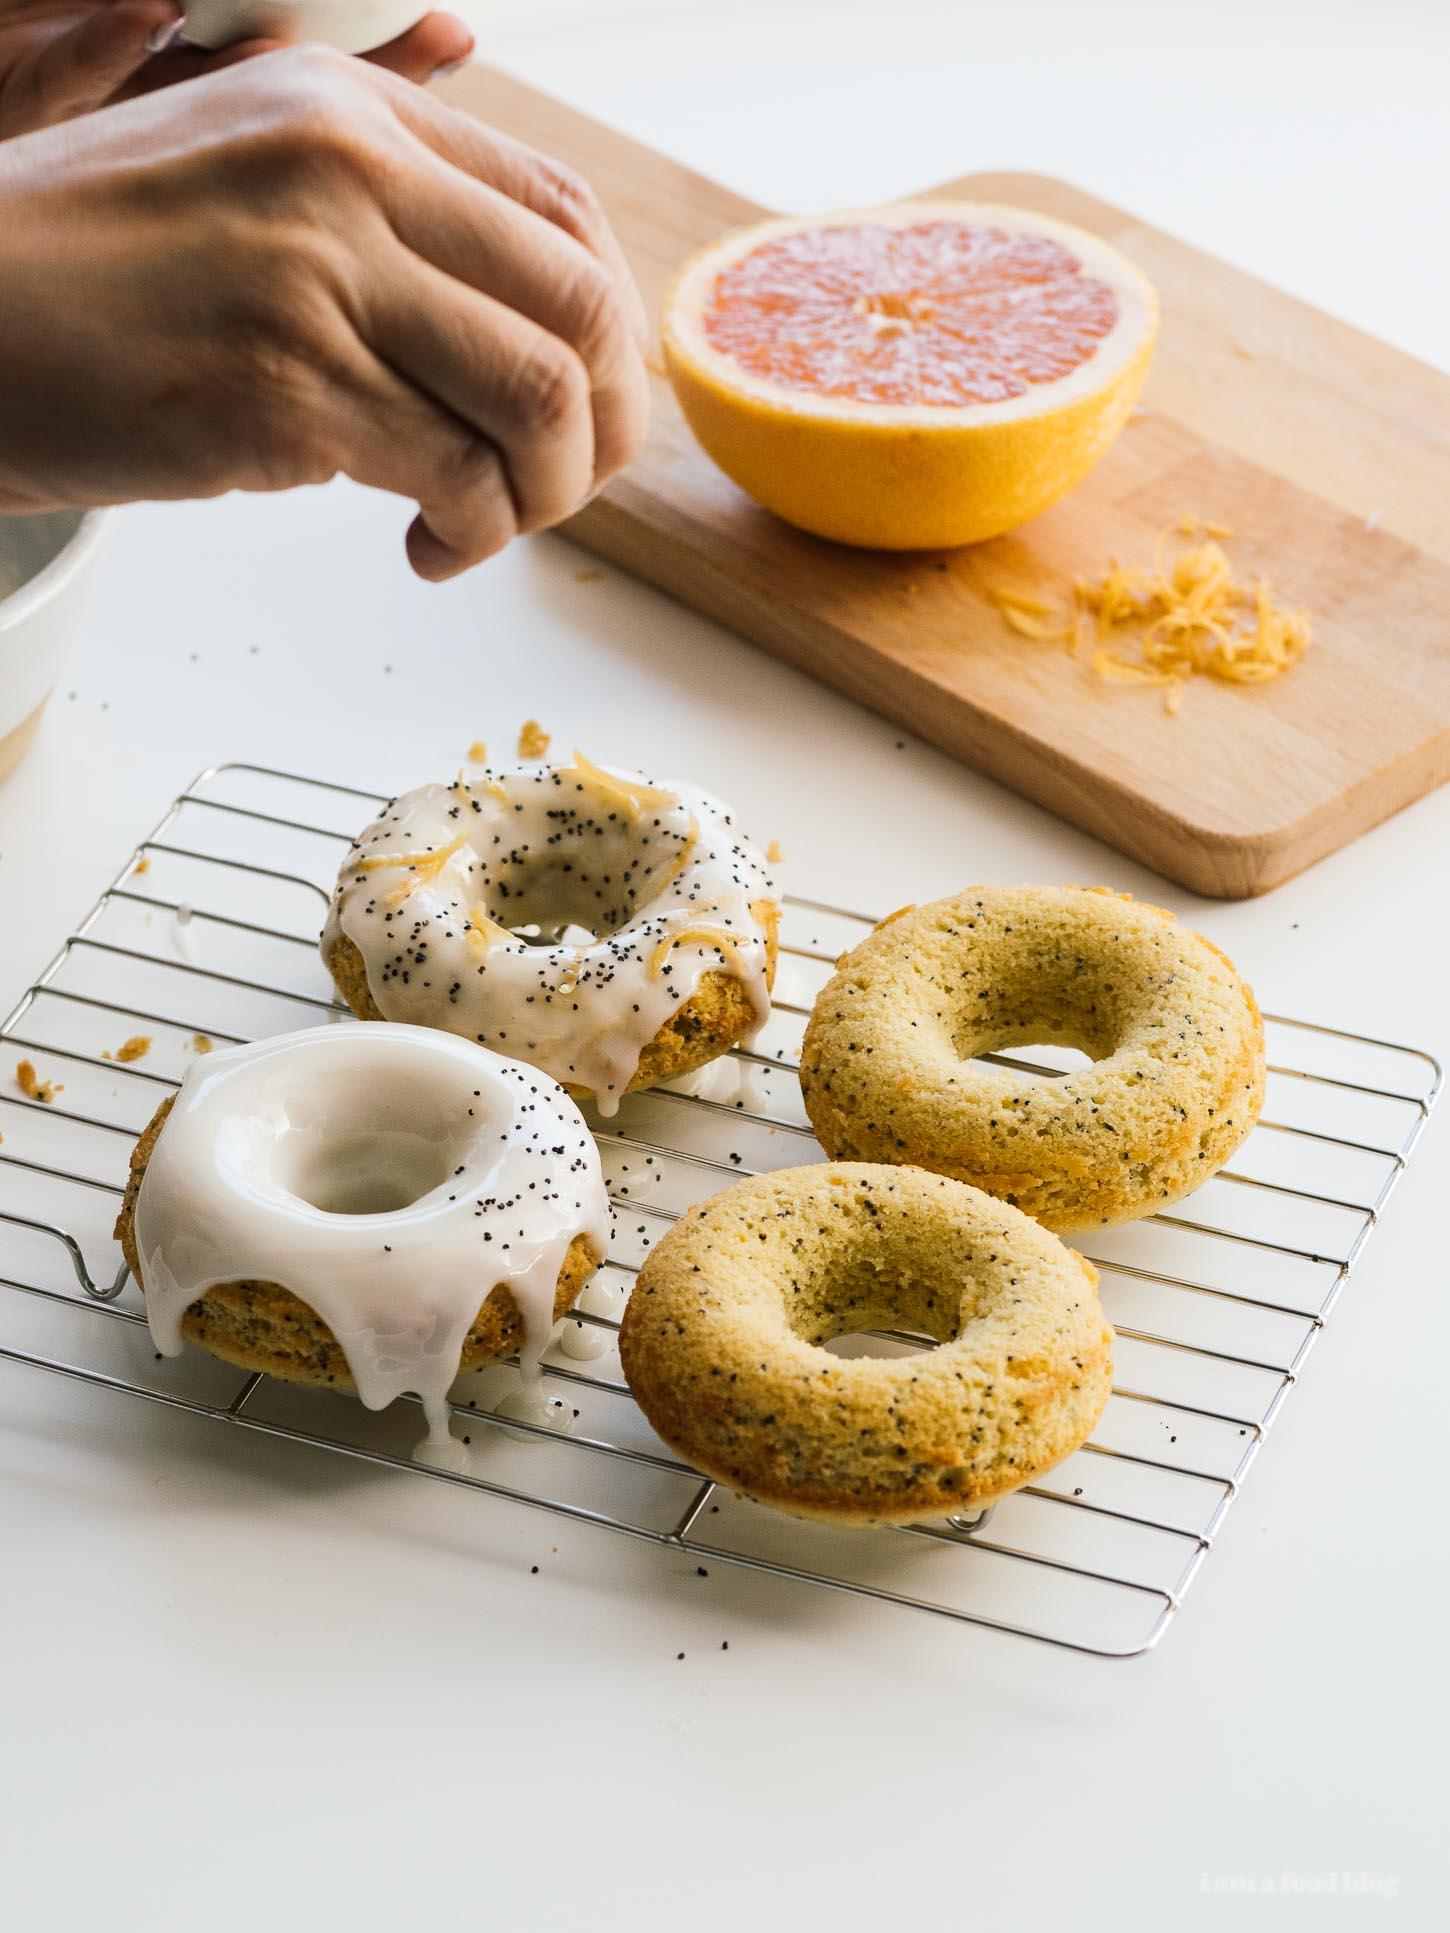 Grapefruit Olive Oil Yogurt Baked Donuts Recipe   www.iamafoodblog.com